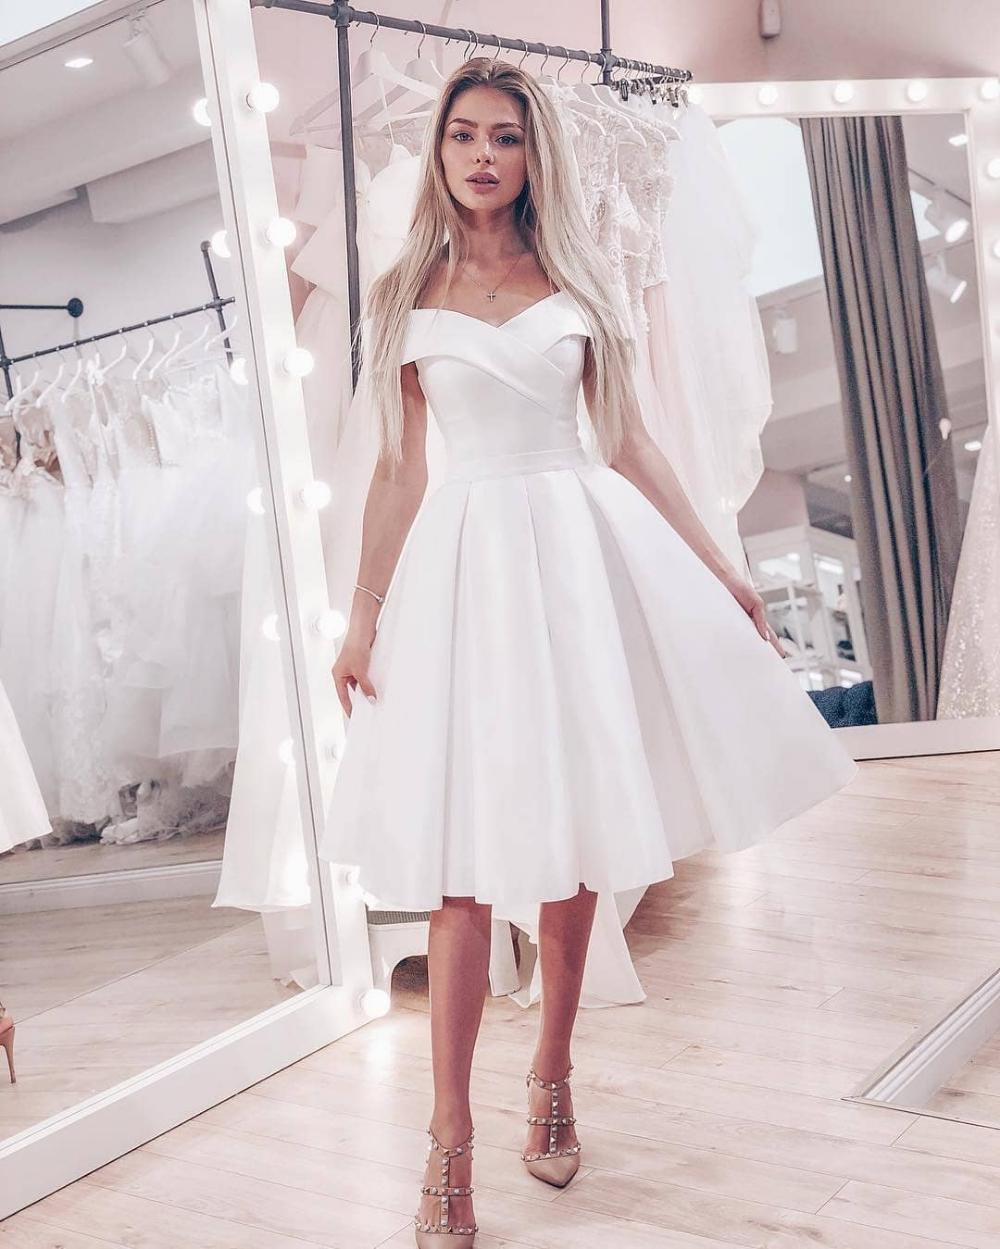 Cute A Line Off Shoulder Short White Off Shoulder White Homecoming Dresses Lv1174 On S Knee Length Wedding Dress Civil Wedding Dresses White Bridesmaid Dresses [ 1249 x 1000 Pixel ]